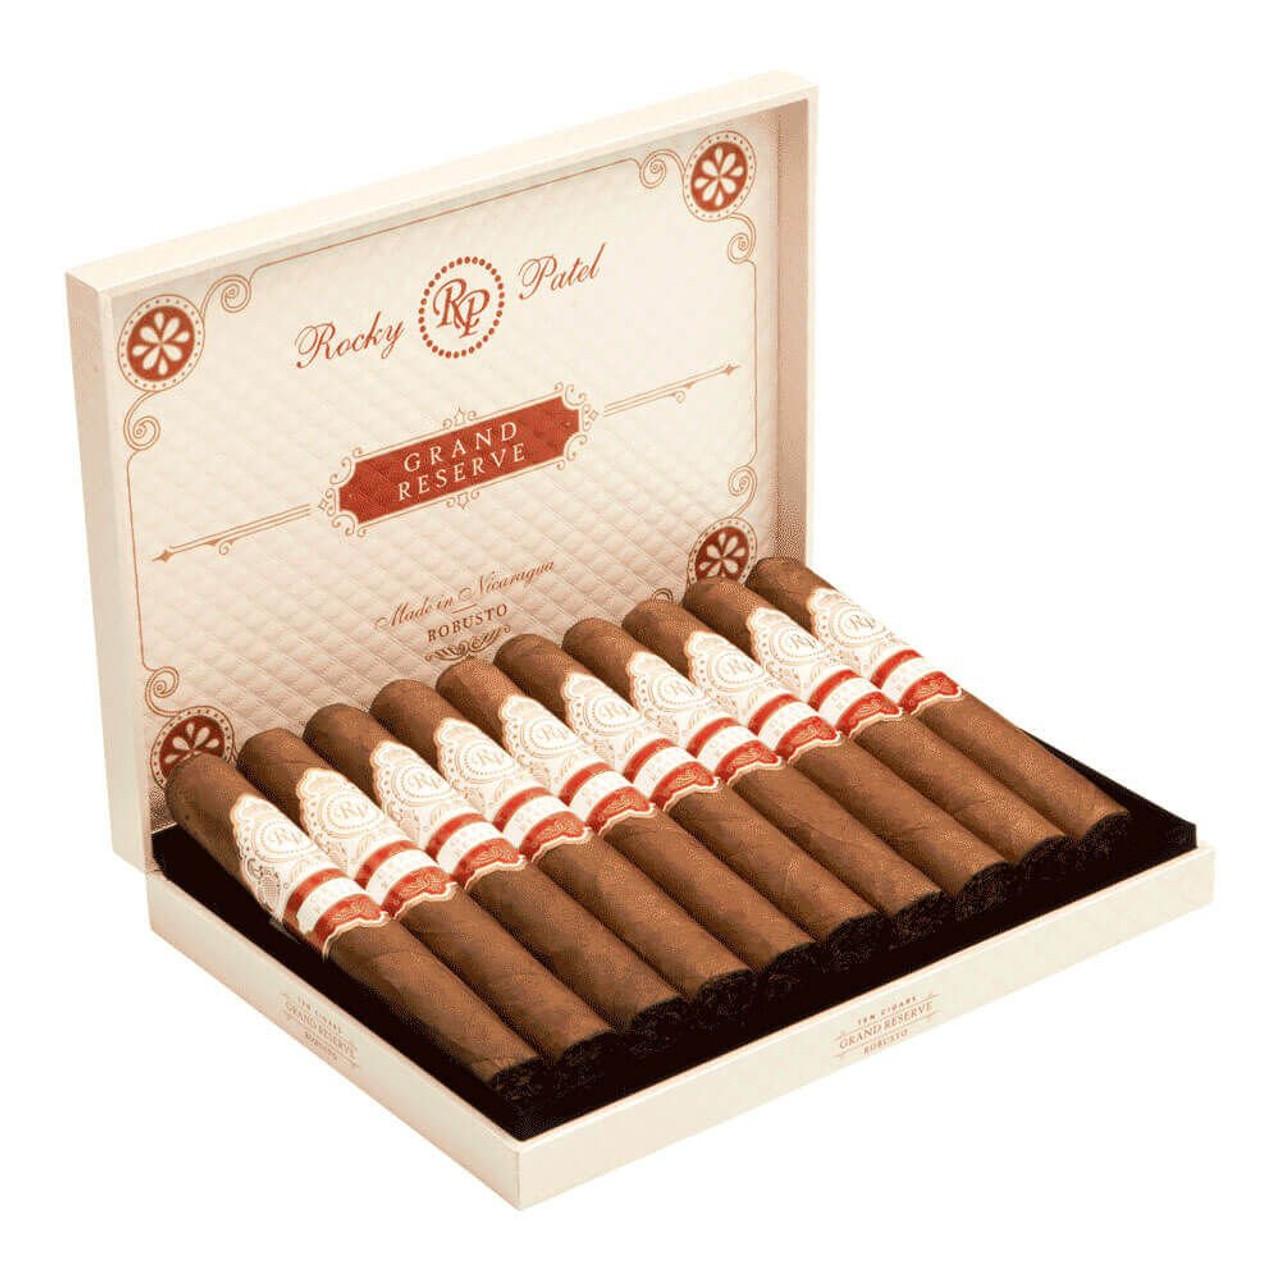 Rocky Patel Grand Reserve Robusto Cigars - 5.5 x 50 (Box of 10)